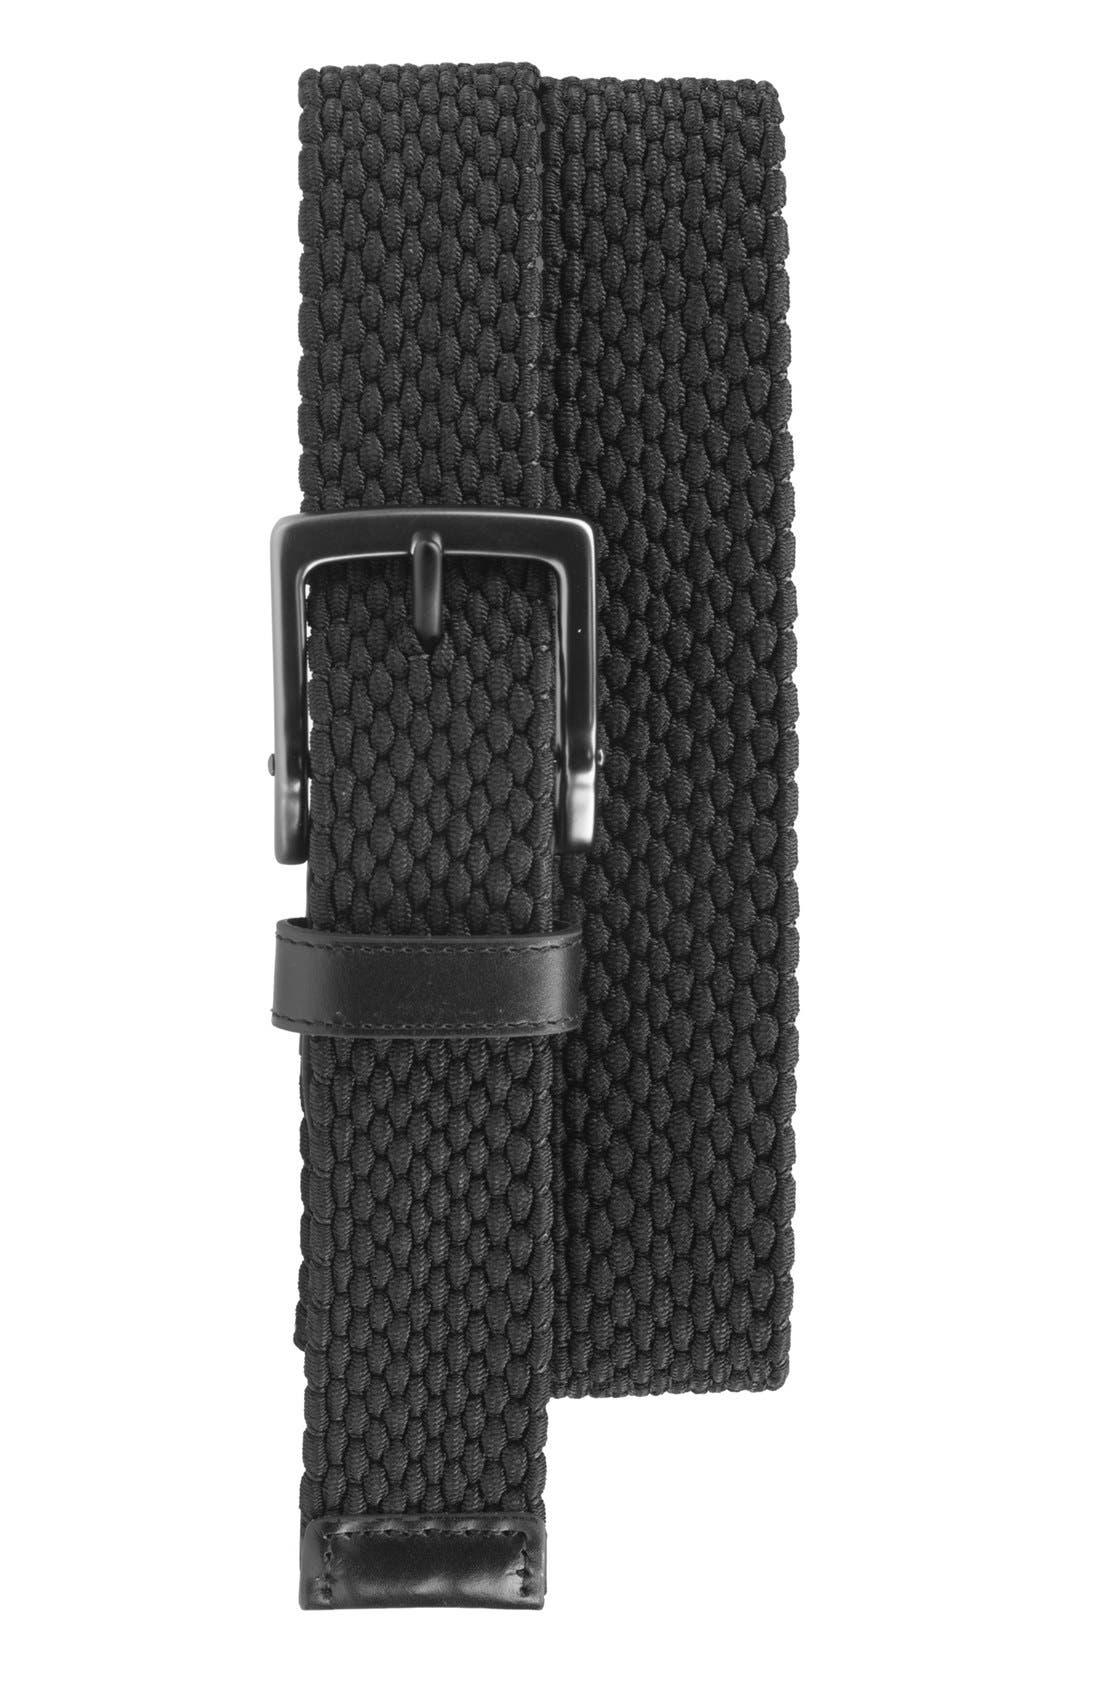 Nike Stretch Woven Belt